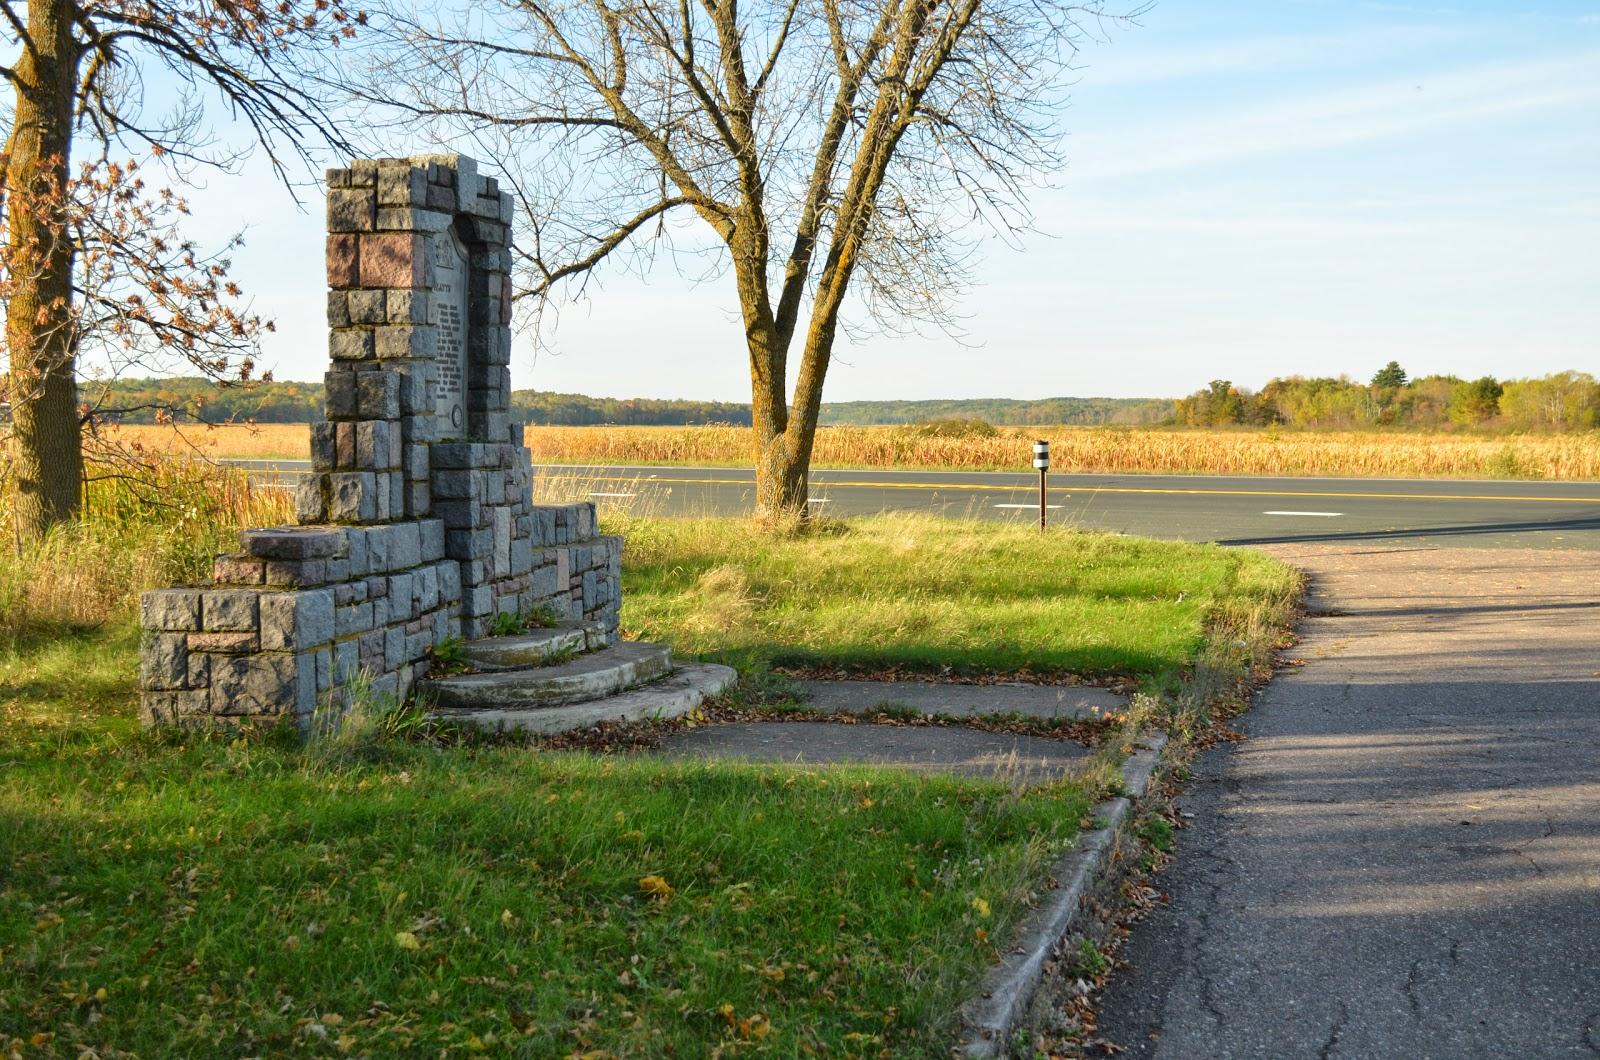 vineland historical marker oct 2013 hwy 169 in background